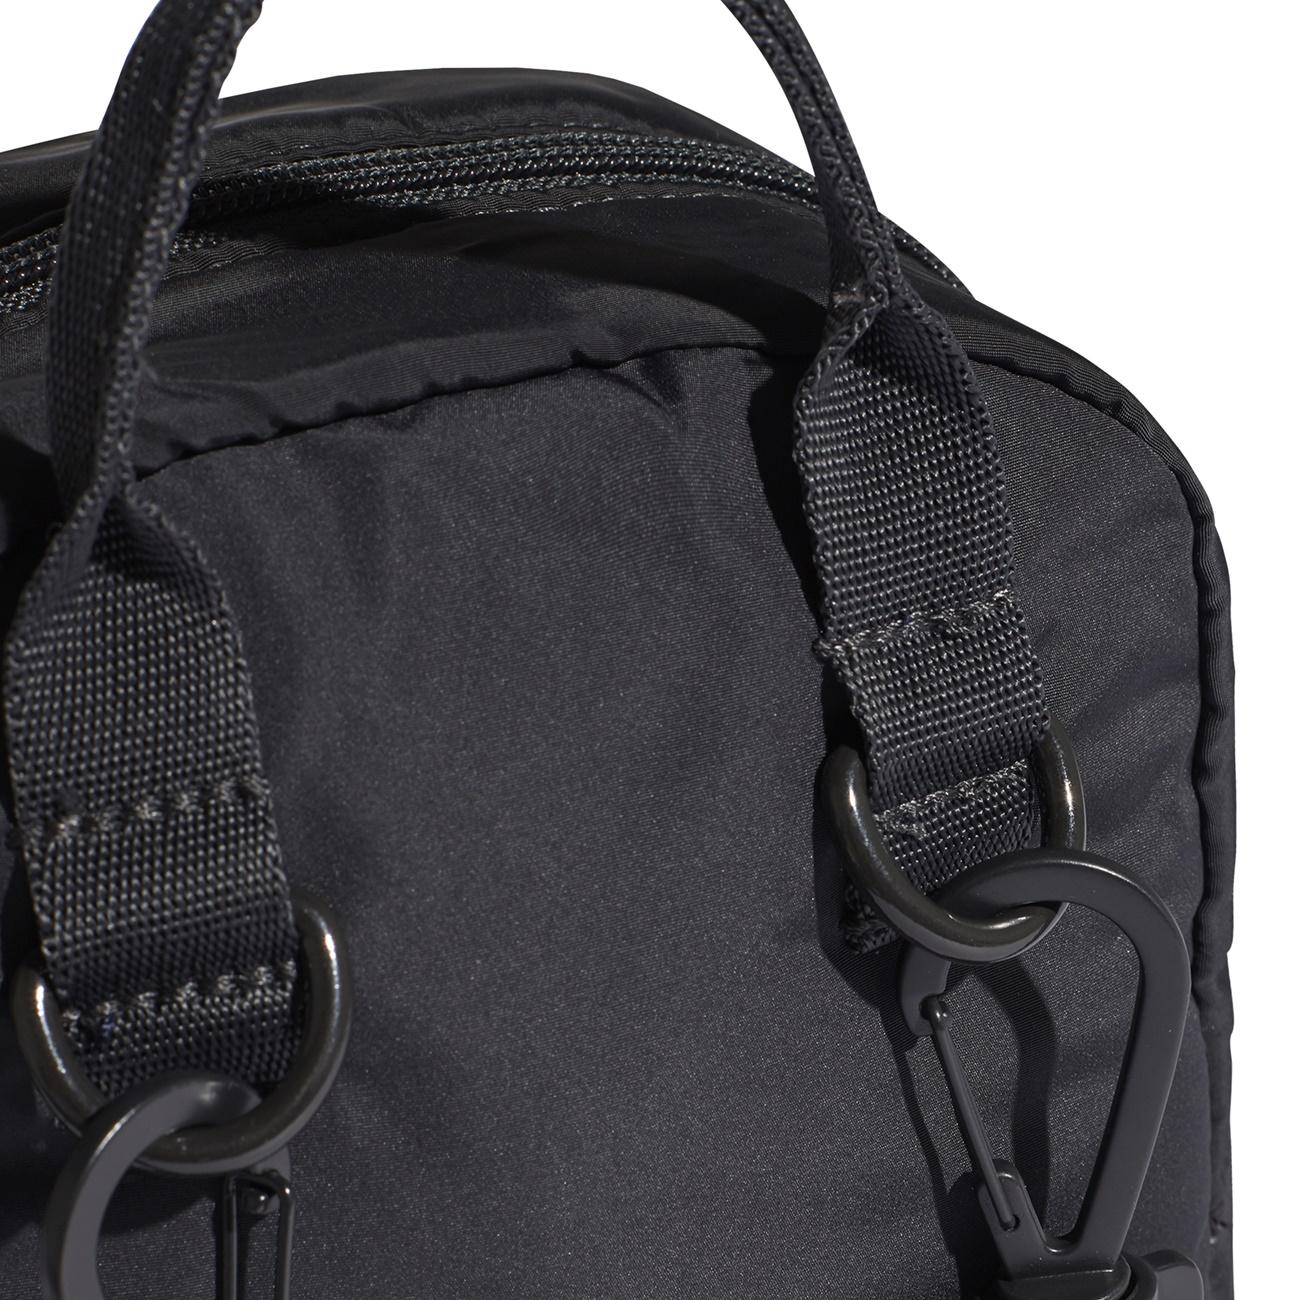 d4eff4af36cb 2017 Adidas Originals Classic Mini Backpack unboxing - YouTube